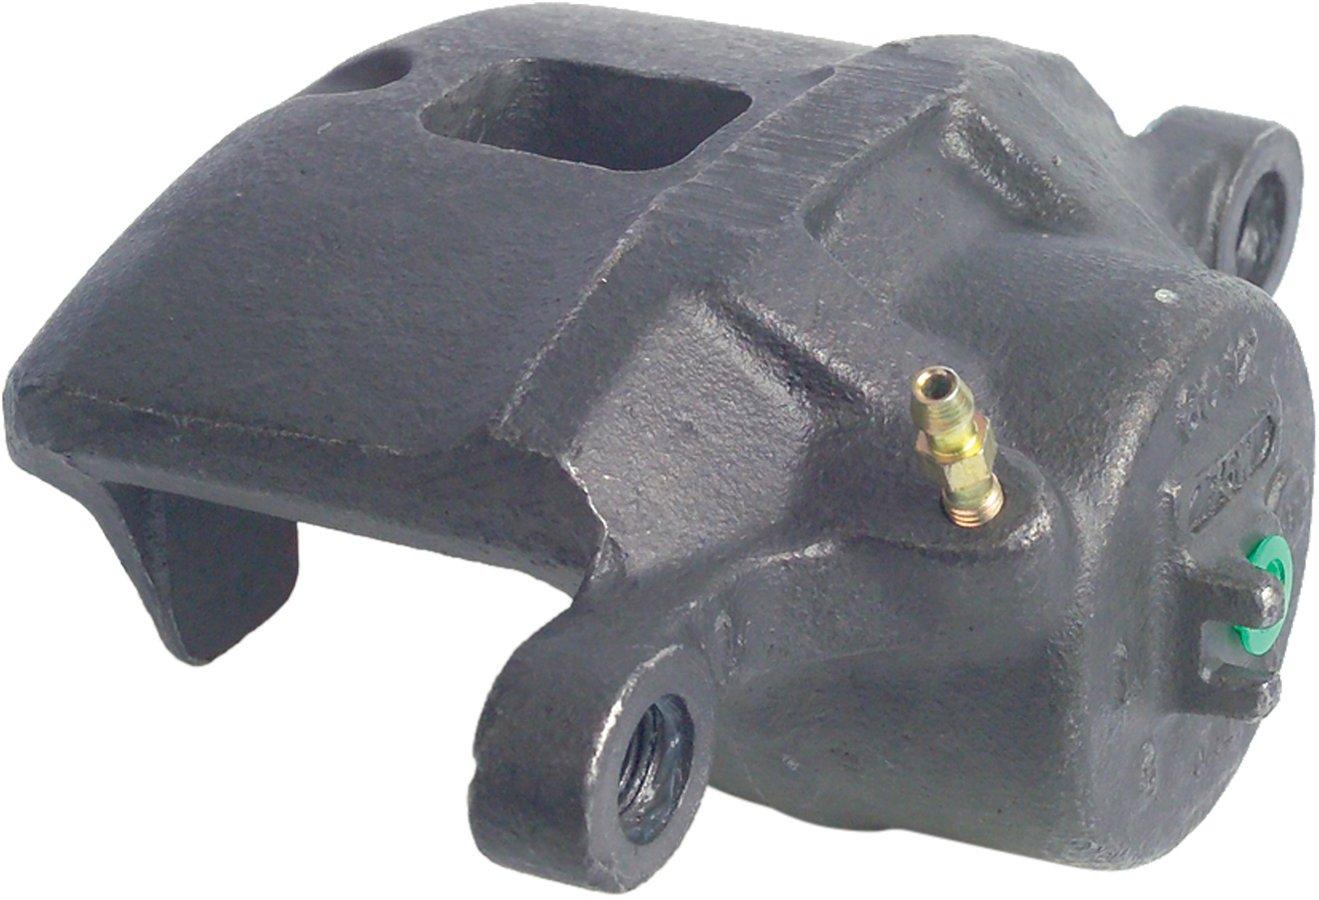 ECCPP Rear Trunk Lift Supports Struts Rods Shocks for 1989-1995 BMW 525i,1994-1995 BMW 530i,1985-1993 BMW 535i,1994-1995 BMW 540i,1991-1993 BMW M5 Compatible with 4472 Strut Set of 2